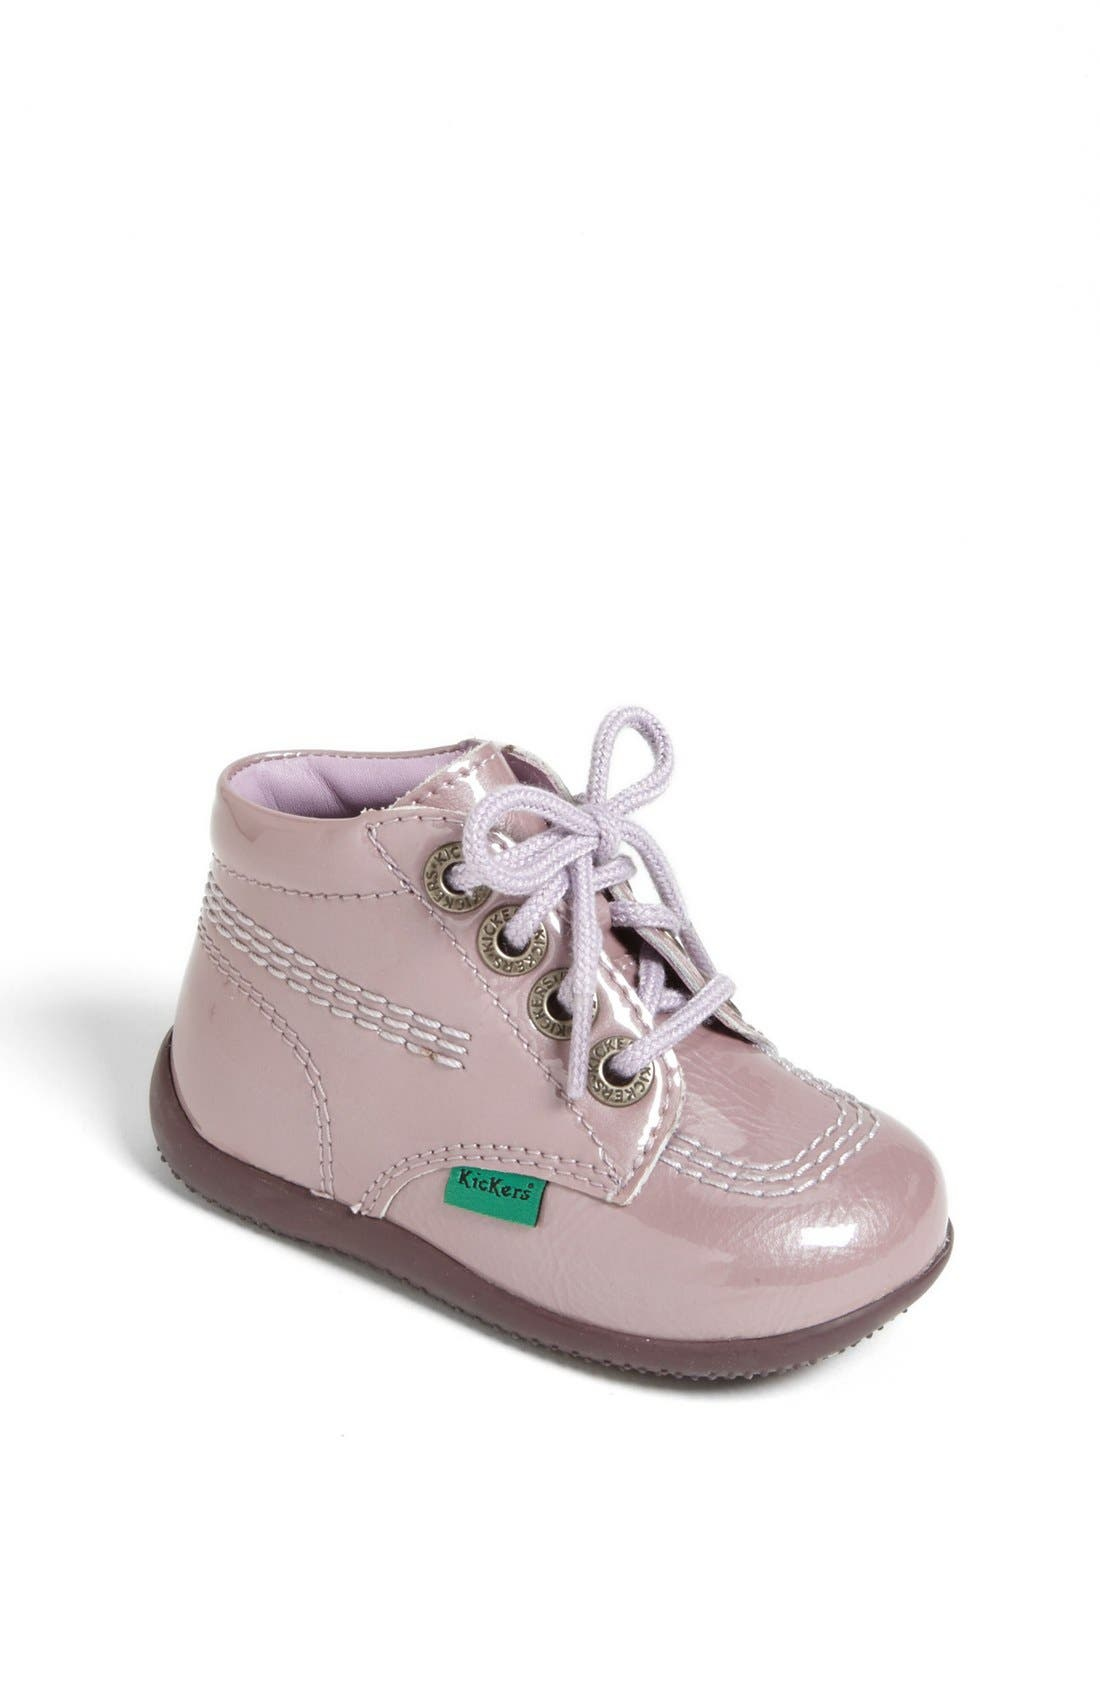 Main Image - Kickers 'Billy 4' Boot (Baby, Walker & Toddler)